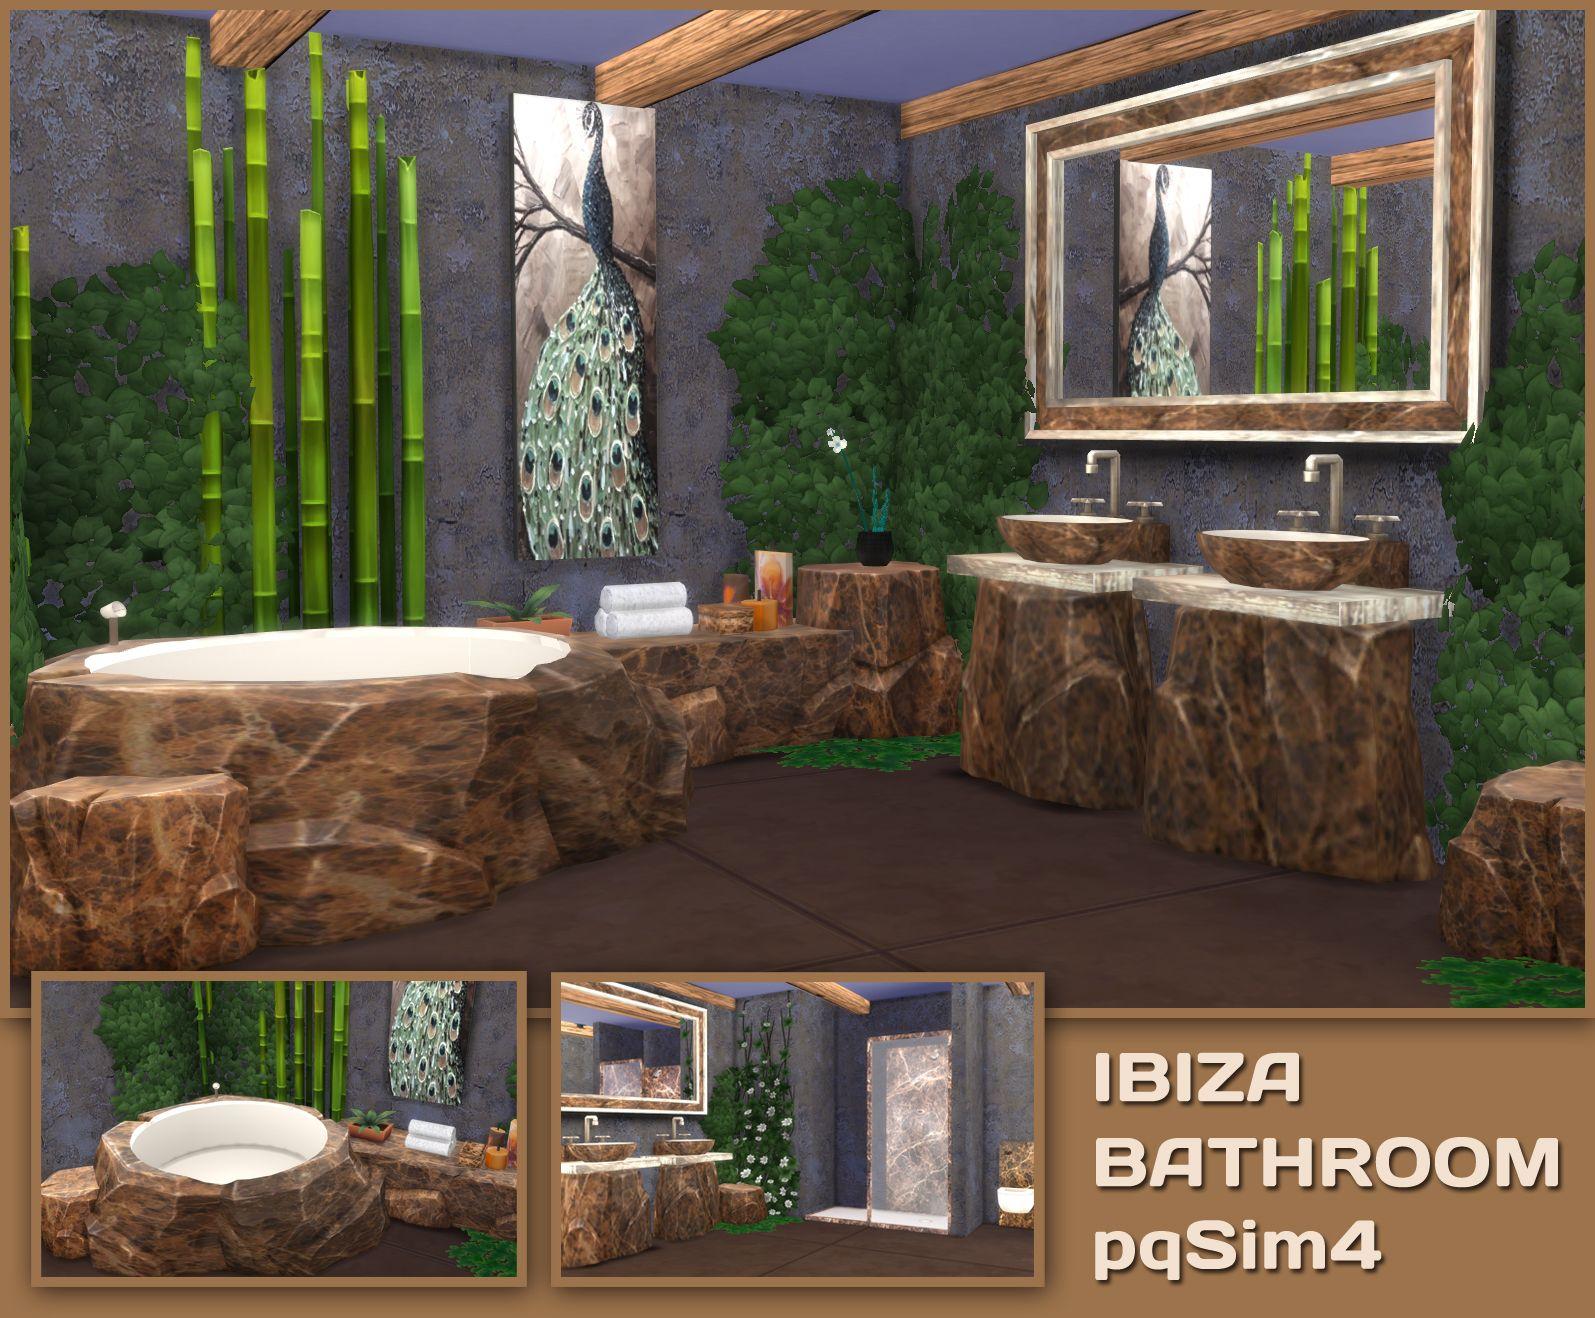 sims 4 bathroom ibiza the sims pinterest ibiza and sims